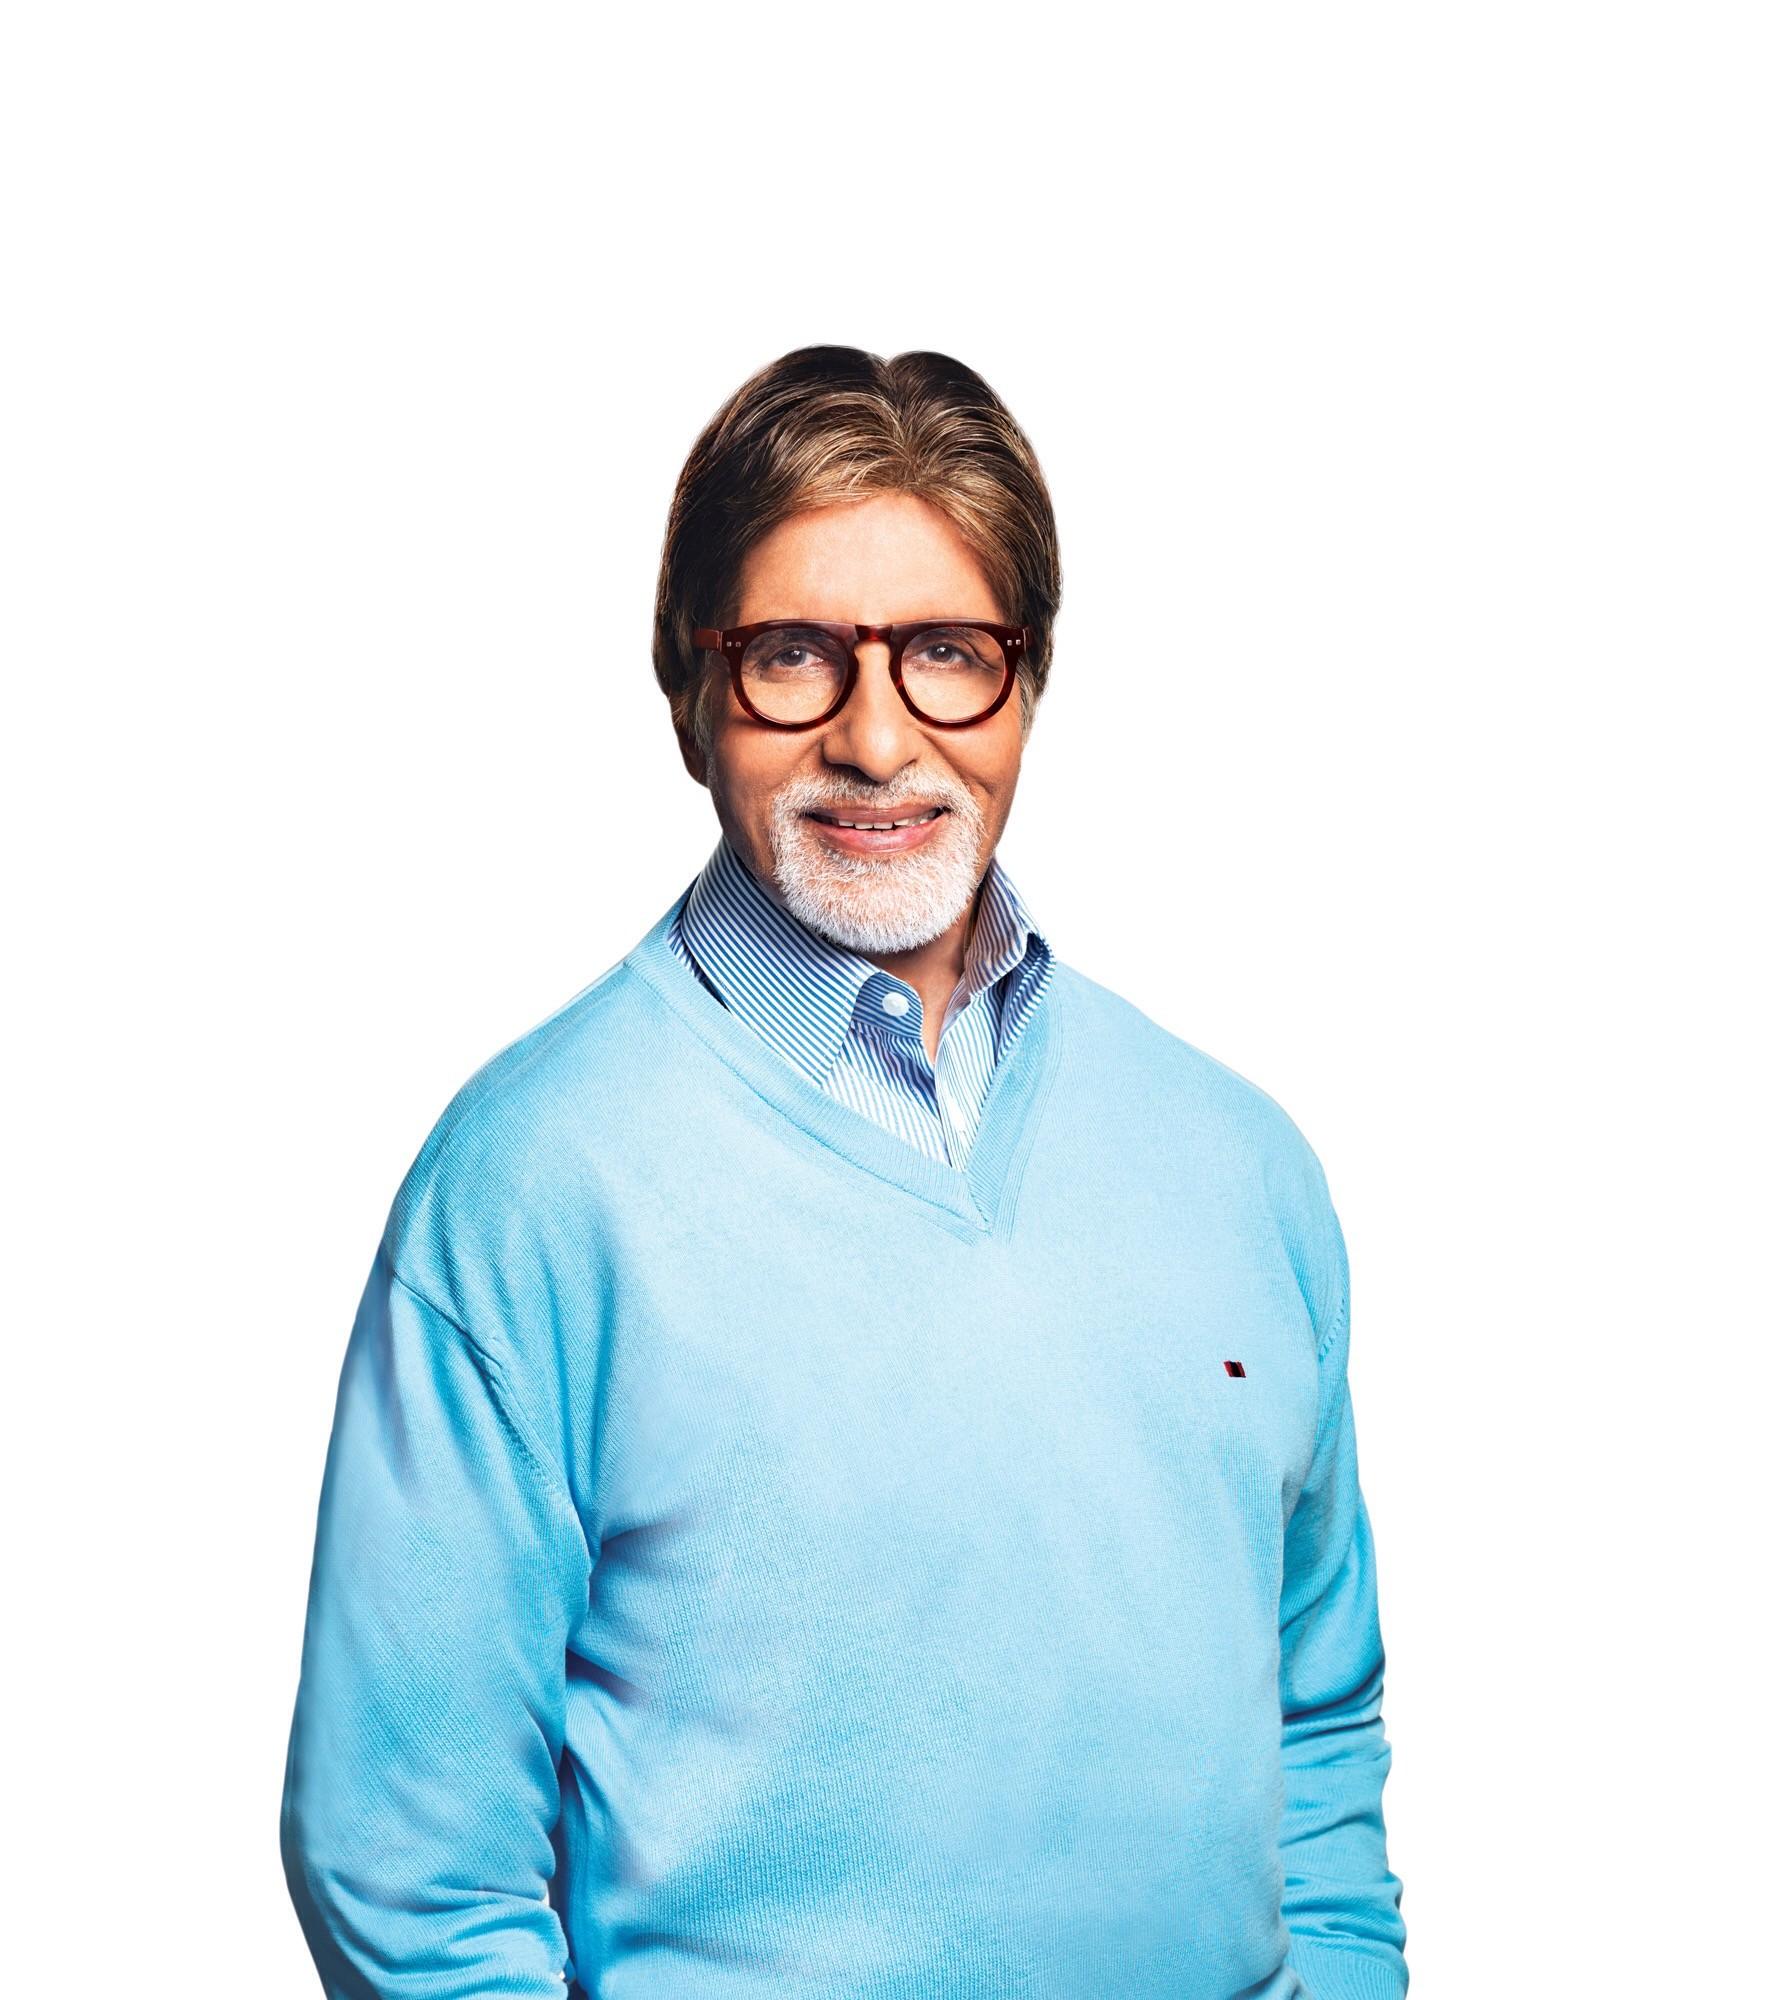 Amitabh Bachchan Biography Career And Net Worth